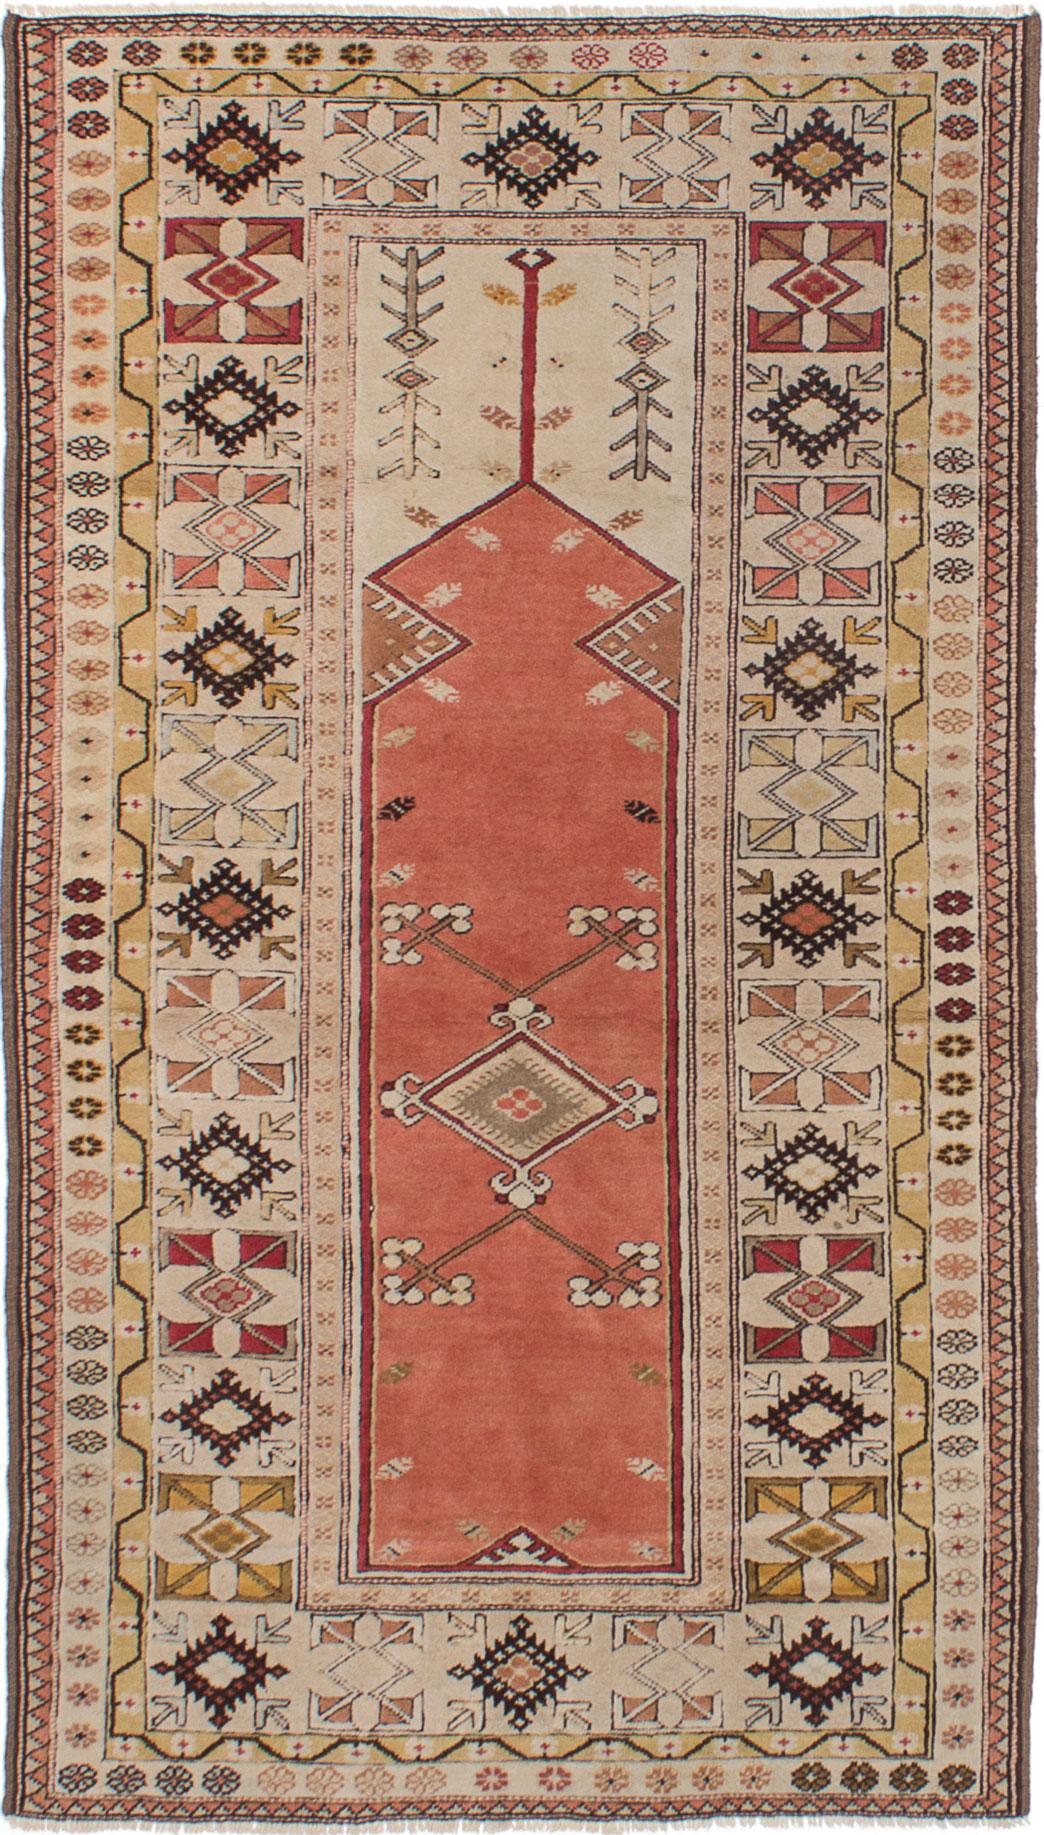 "Hand-knotted Ushak Cream, Dark Copper Wool Rug 3'11"" x 6'11"" Size: 3'11"" x 6'11"""